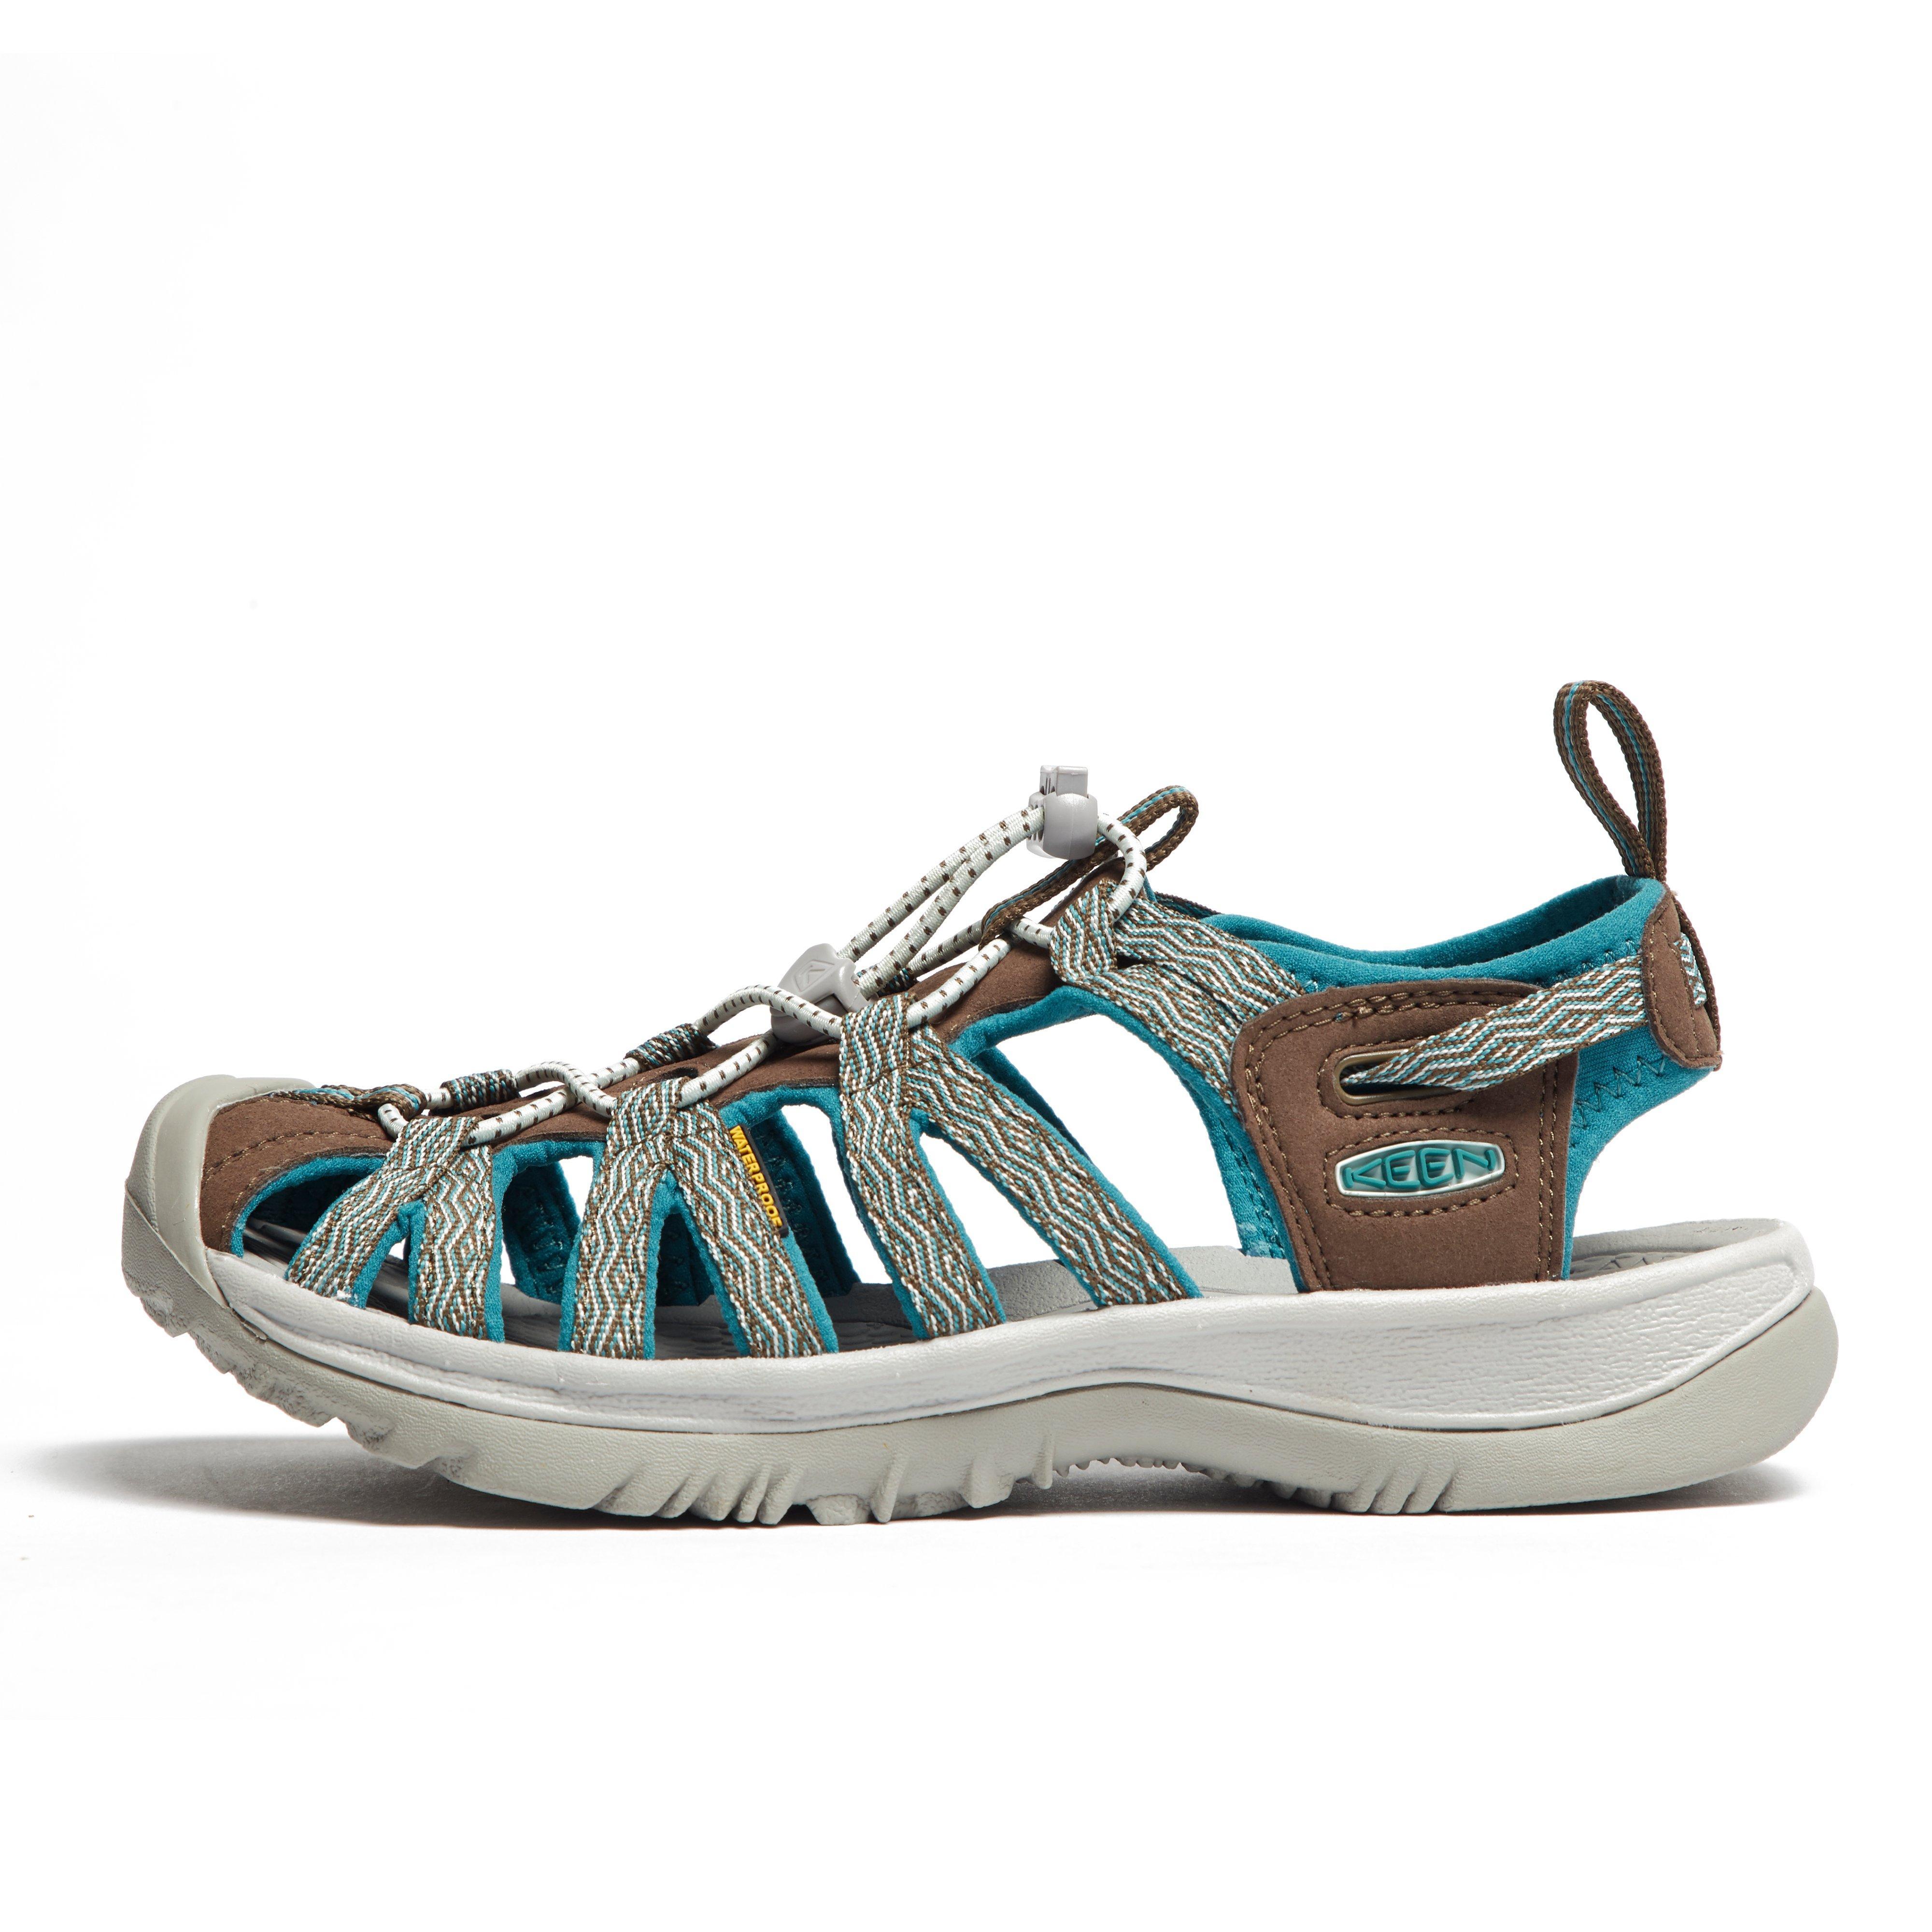 5581ac7402b6 Details about Keen Whisper Women s Walking Sandals